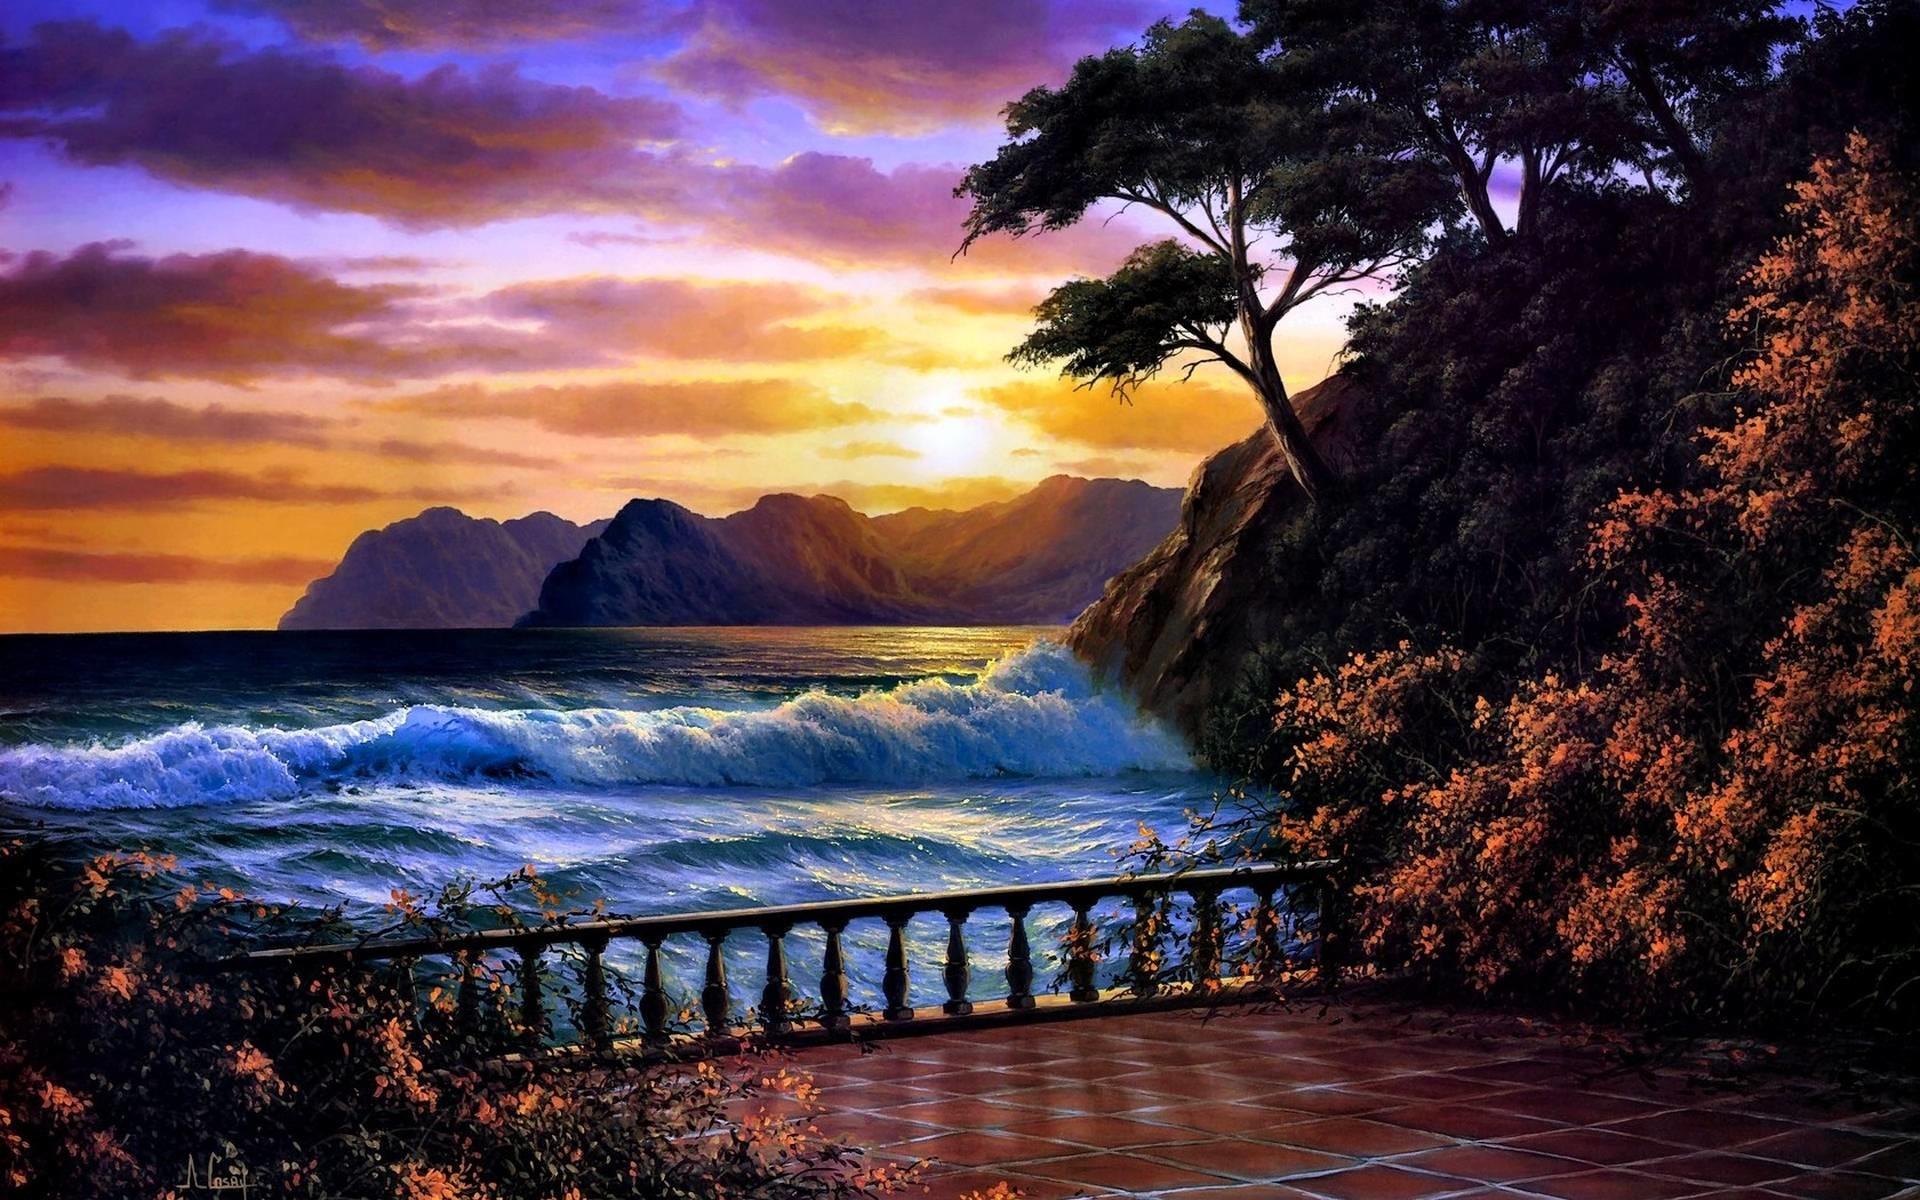 beautiful sunset hd wallpapers – DriverLayer Search Engine